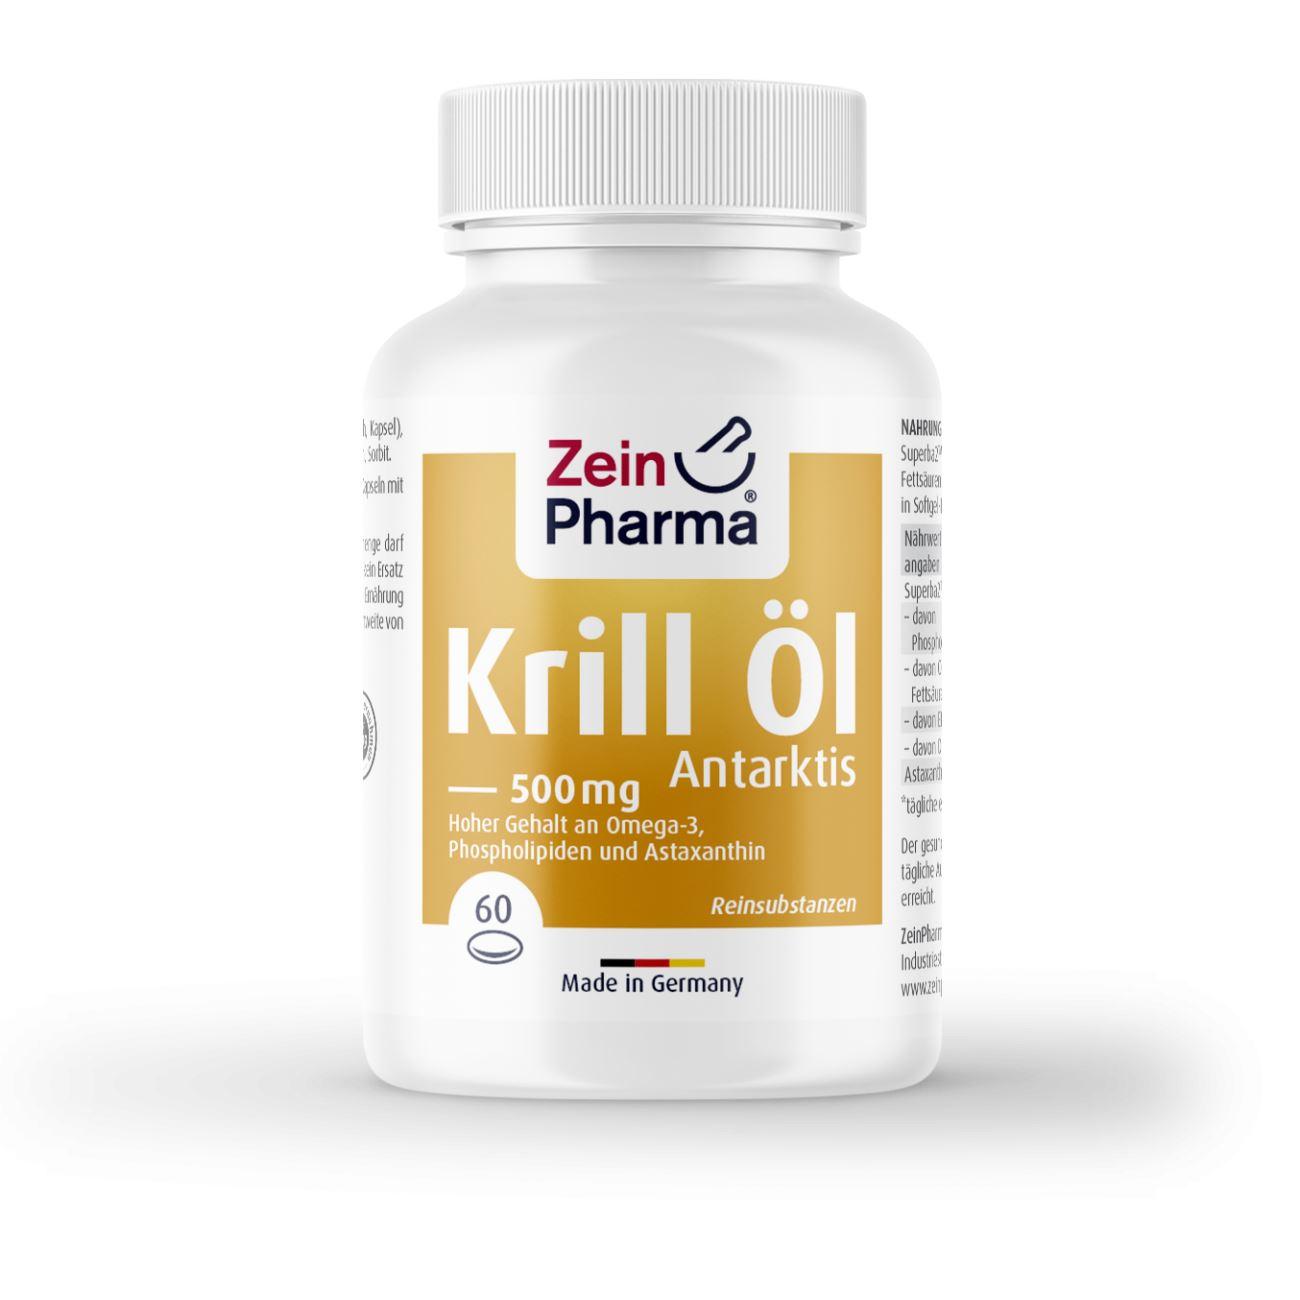 Krill-Öl Omega-3 Antarktis 500 mg - 60 Kapseln